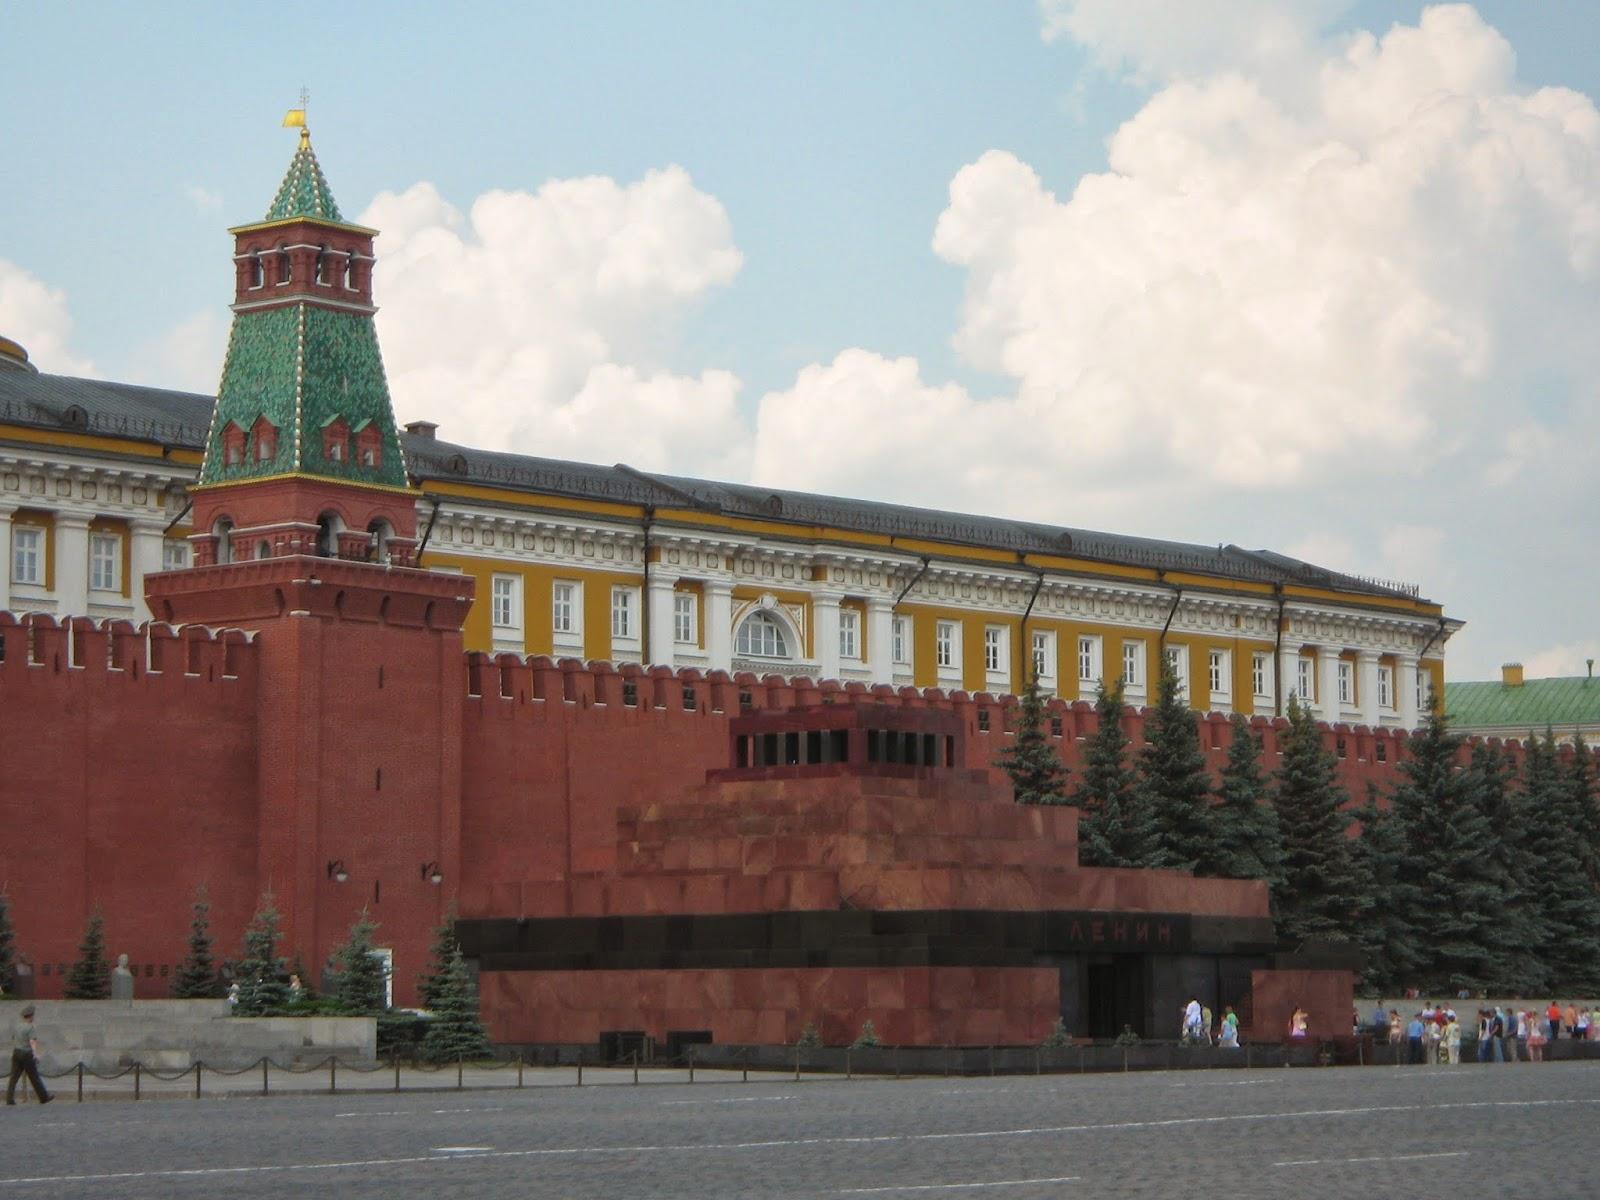 Kostroma Devlet Tarımsal Akademisi: fakülteler 8